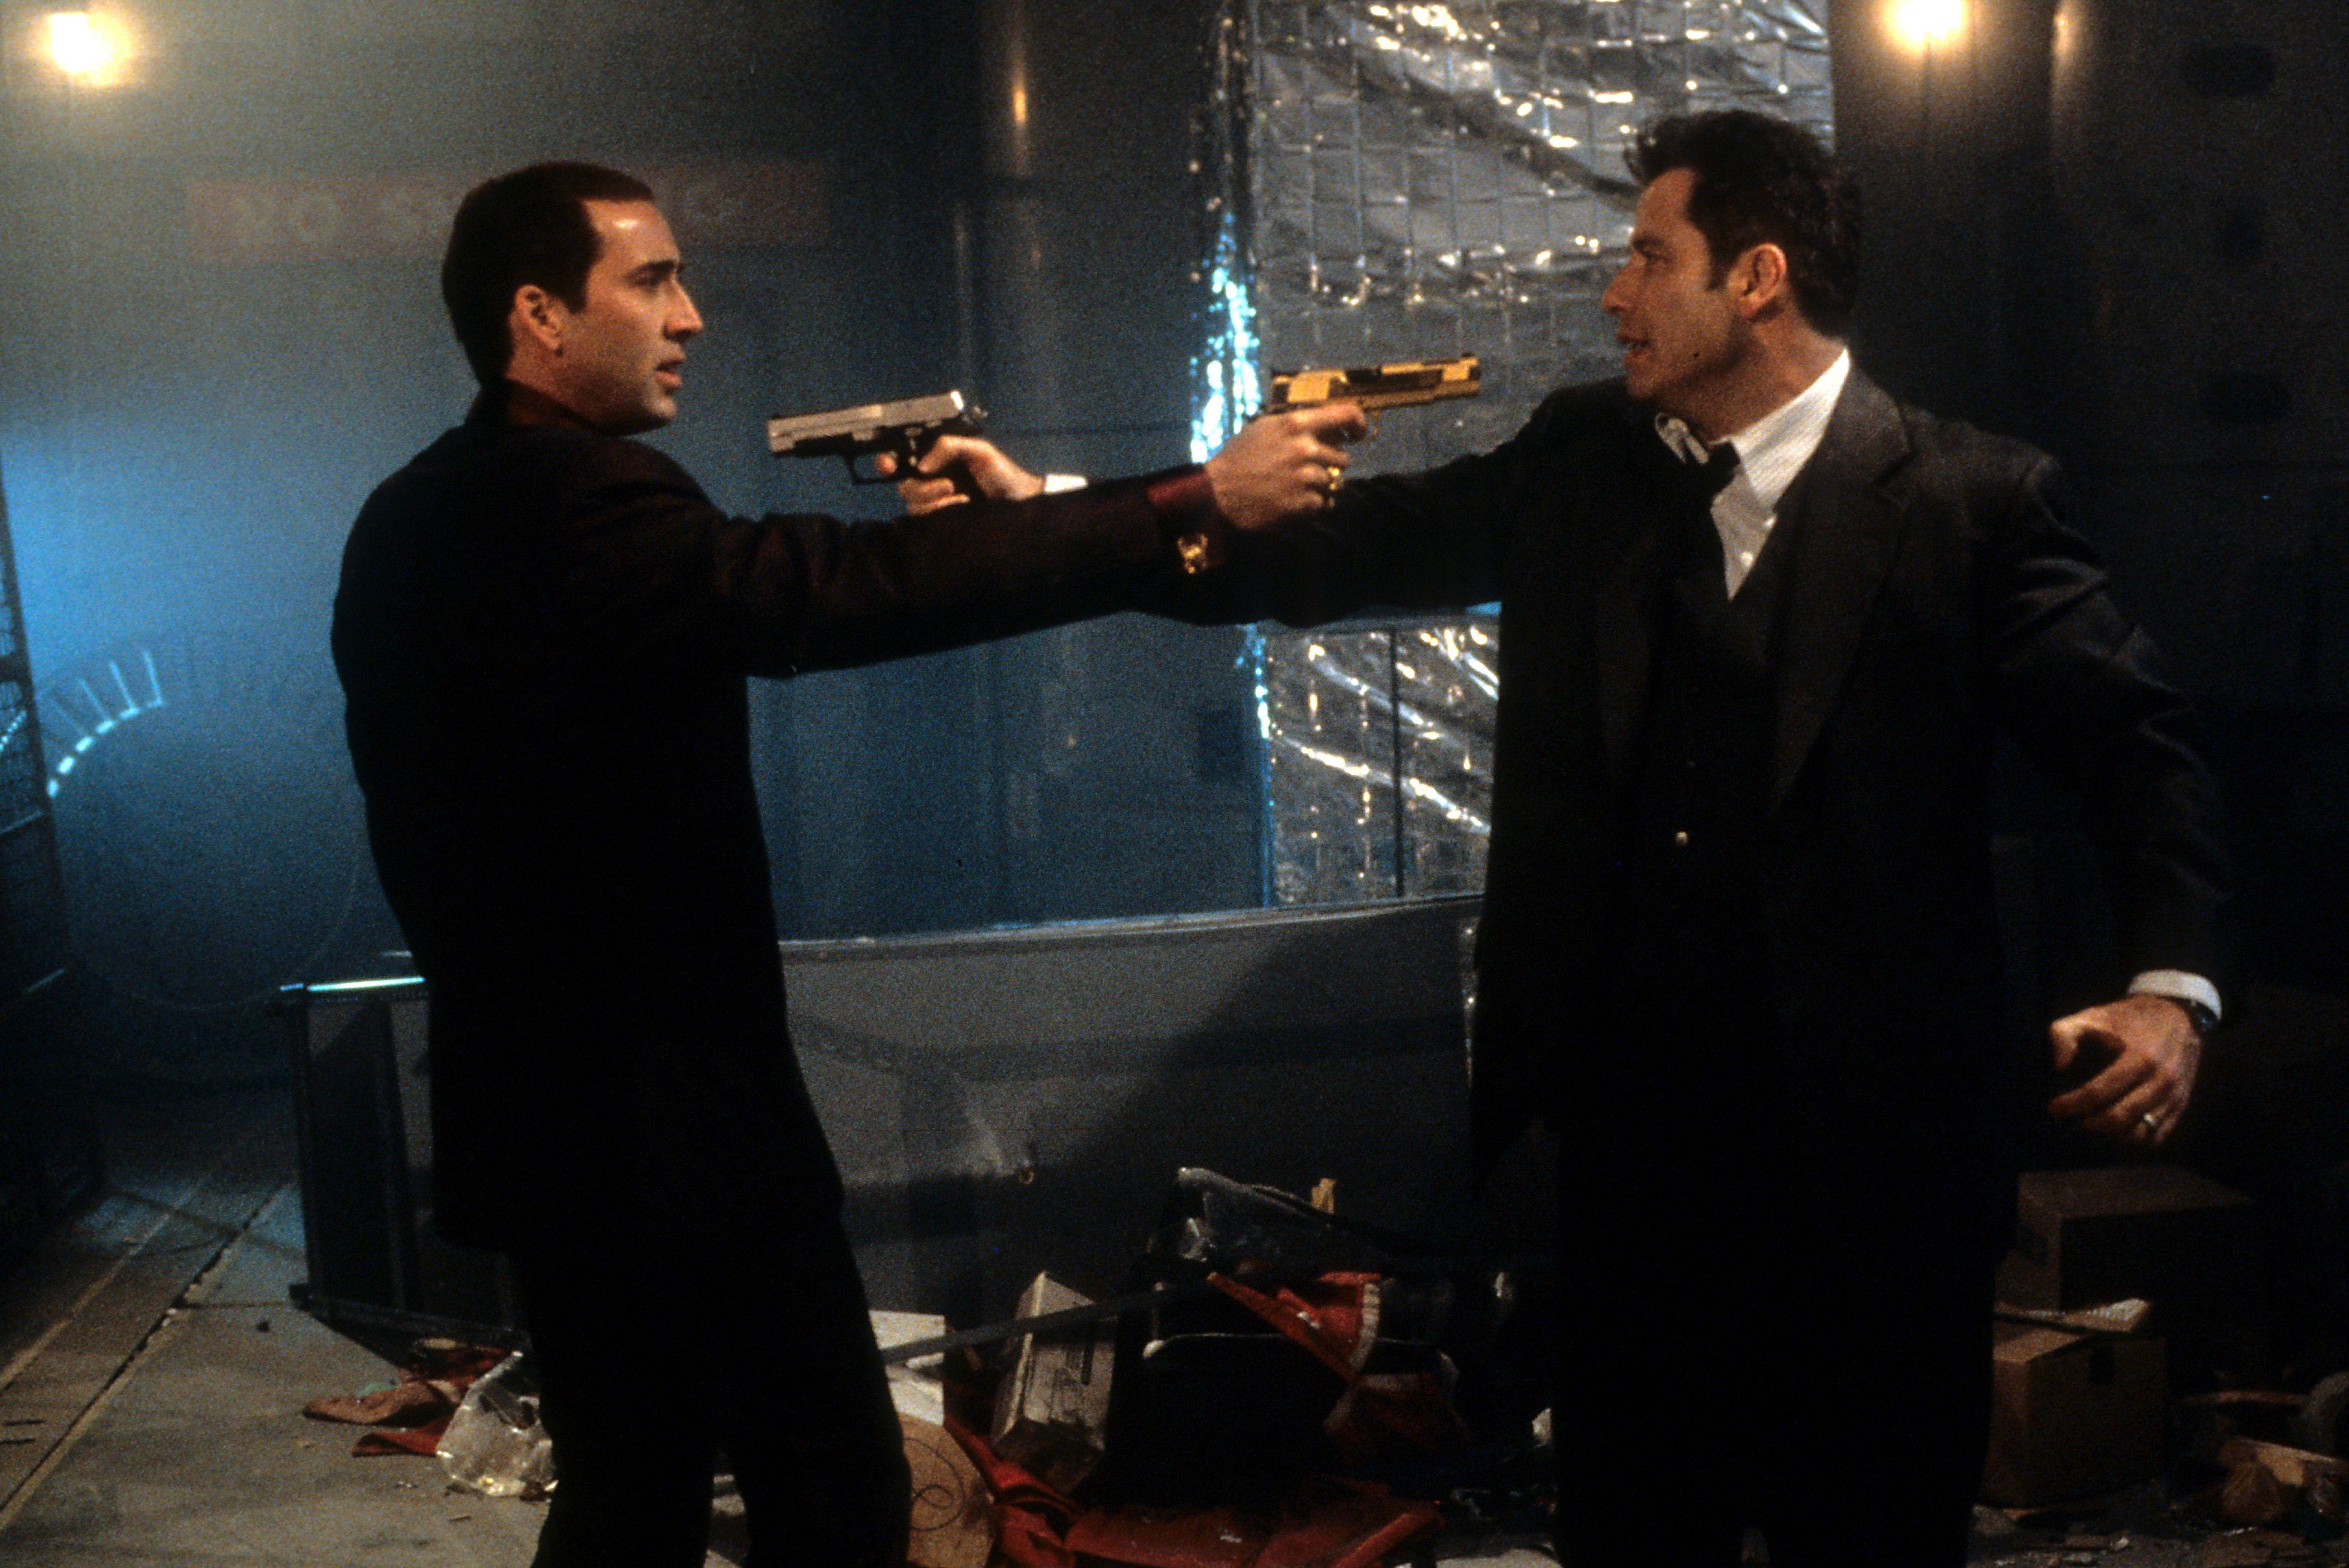 Nicolas Cage (left) and John Travolta in Face/Off